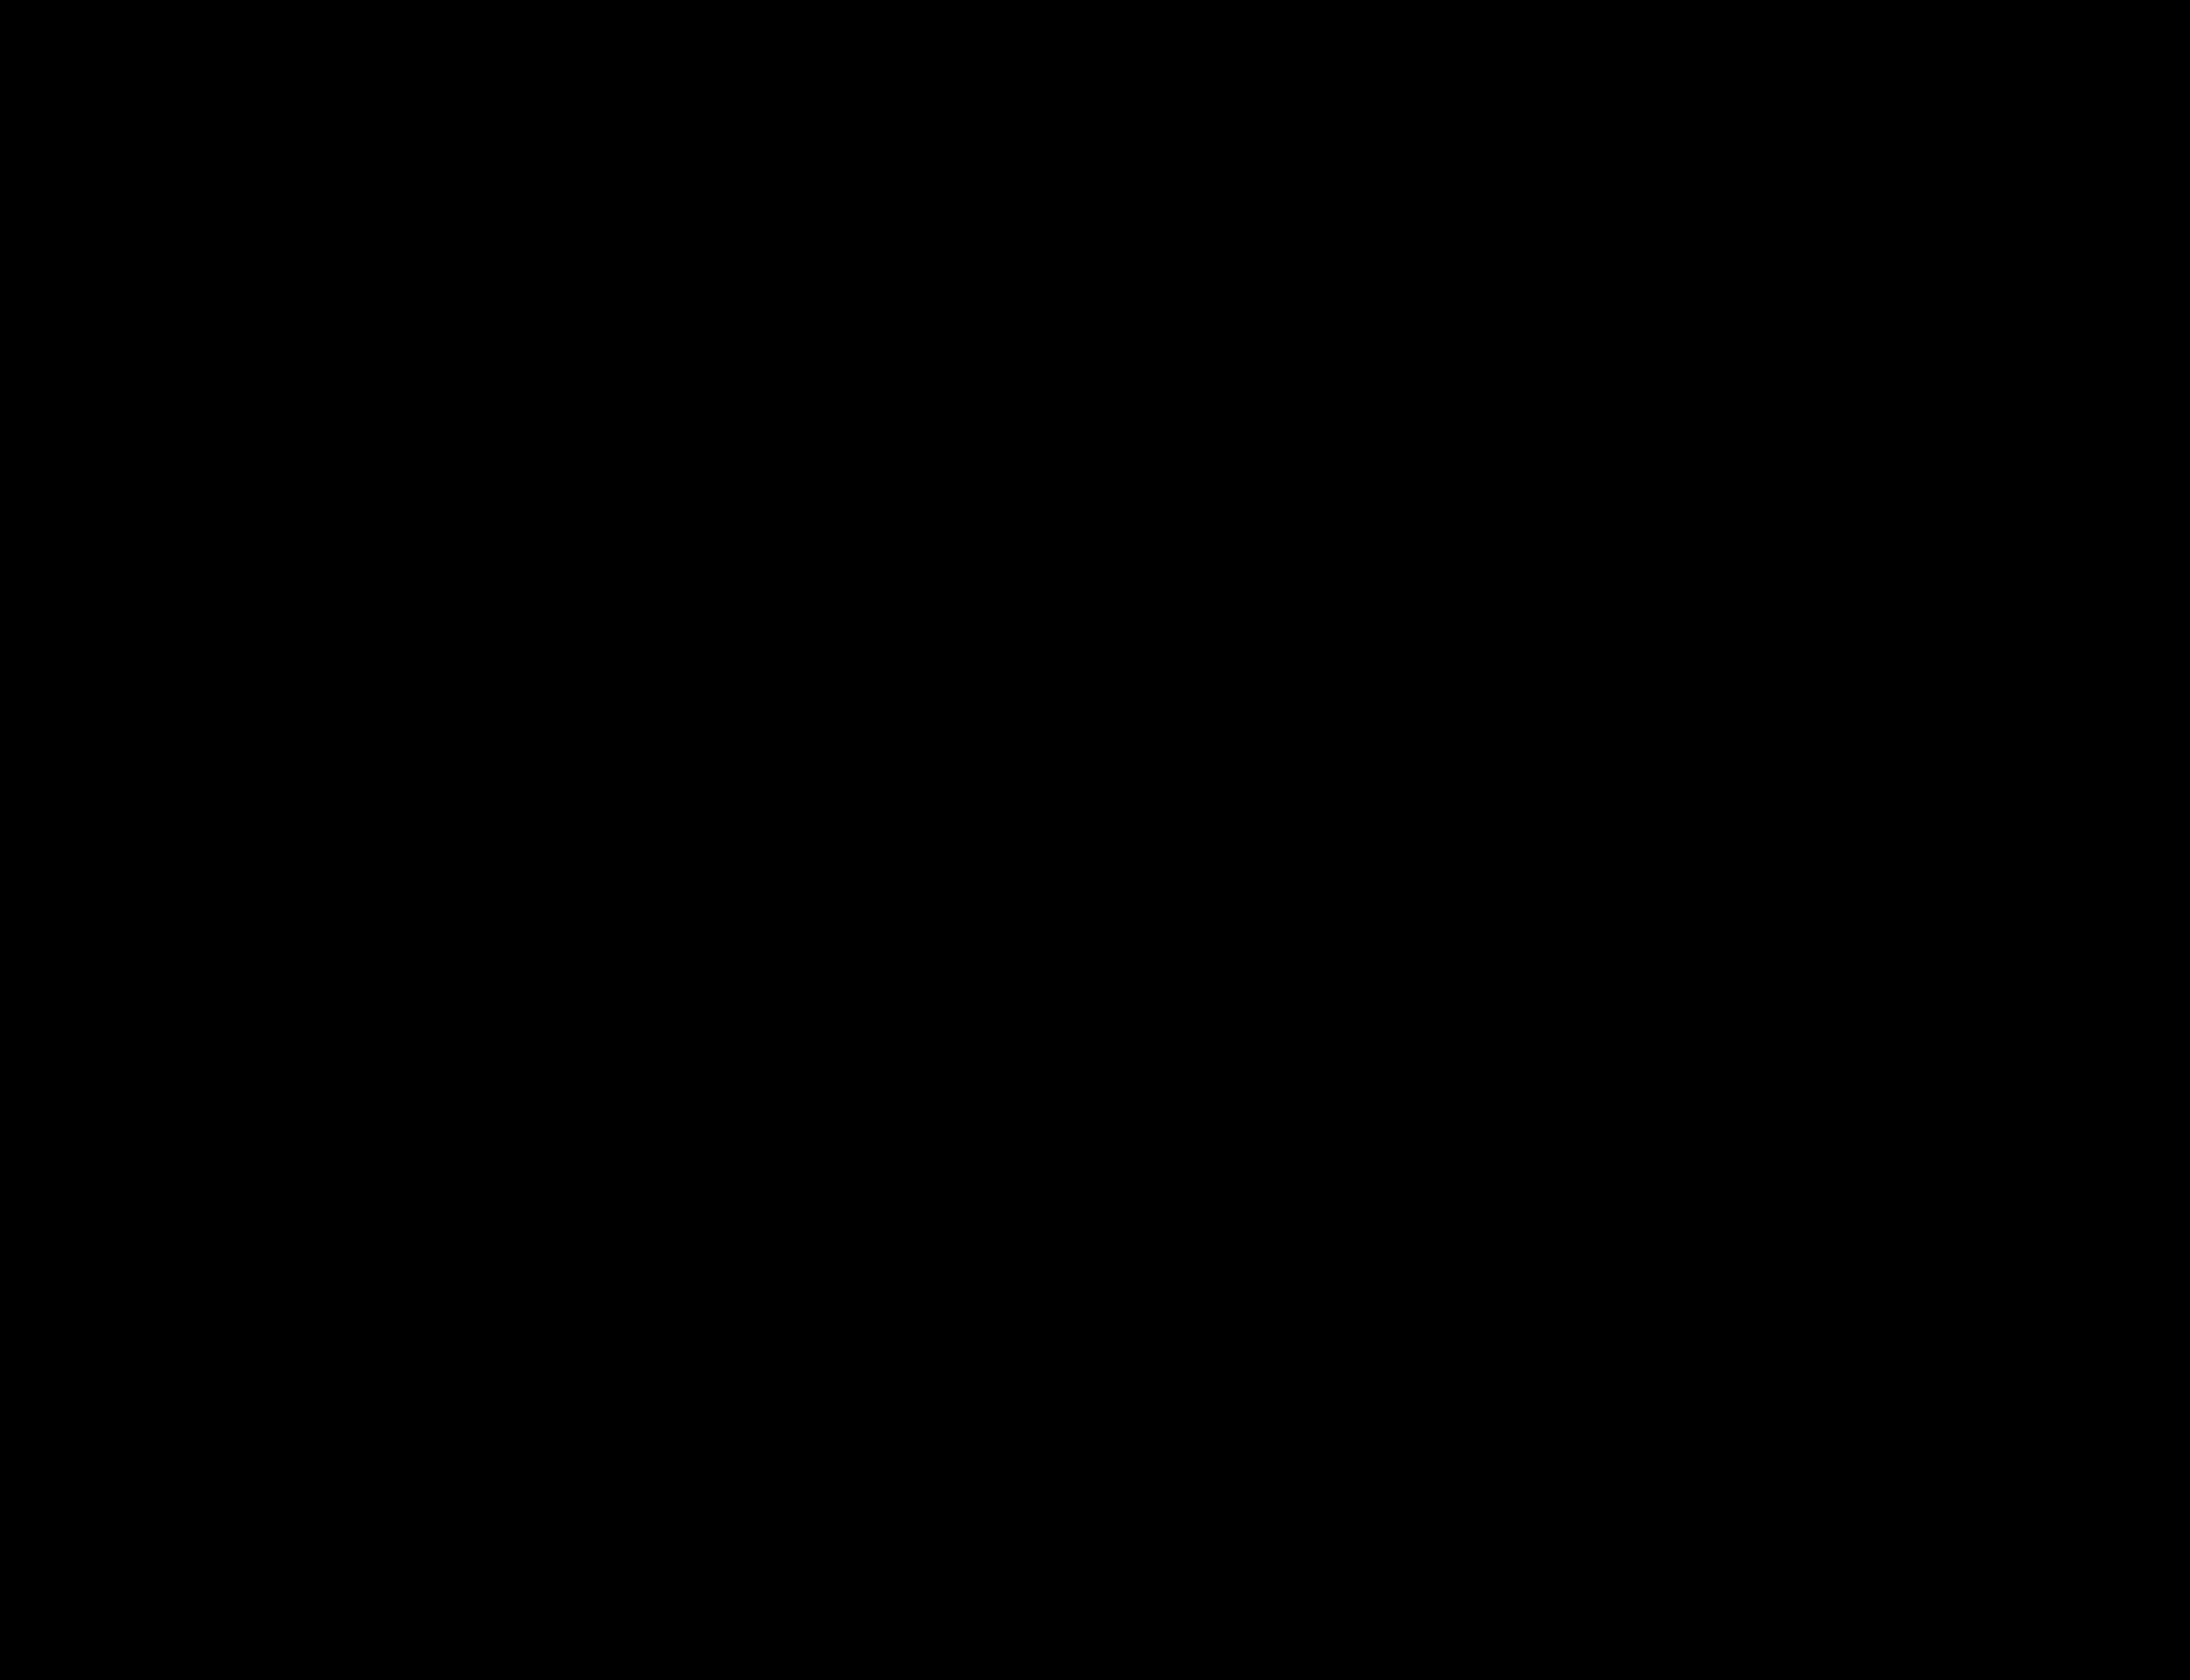 File:Comedy Central Logo 2011 vertikal.png.